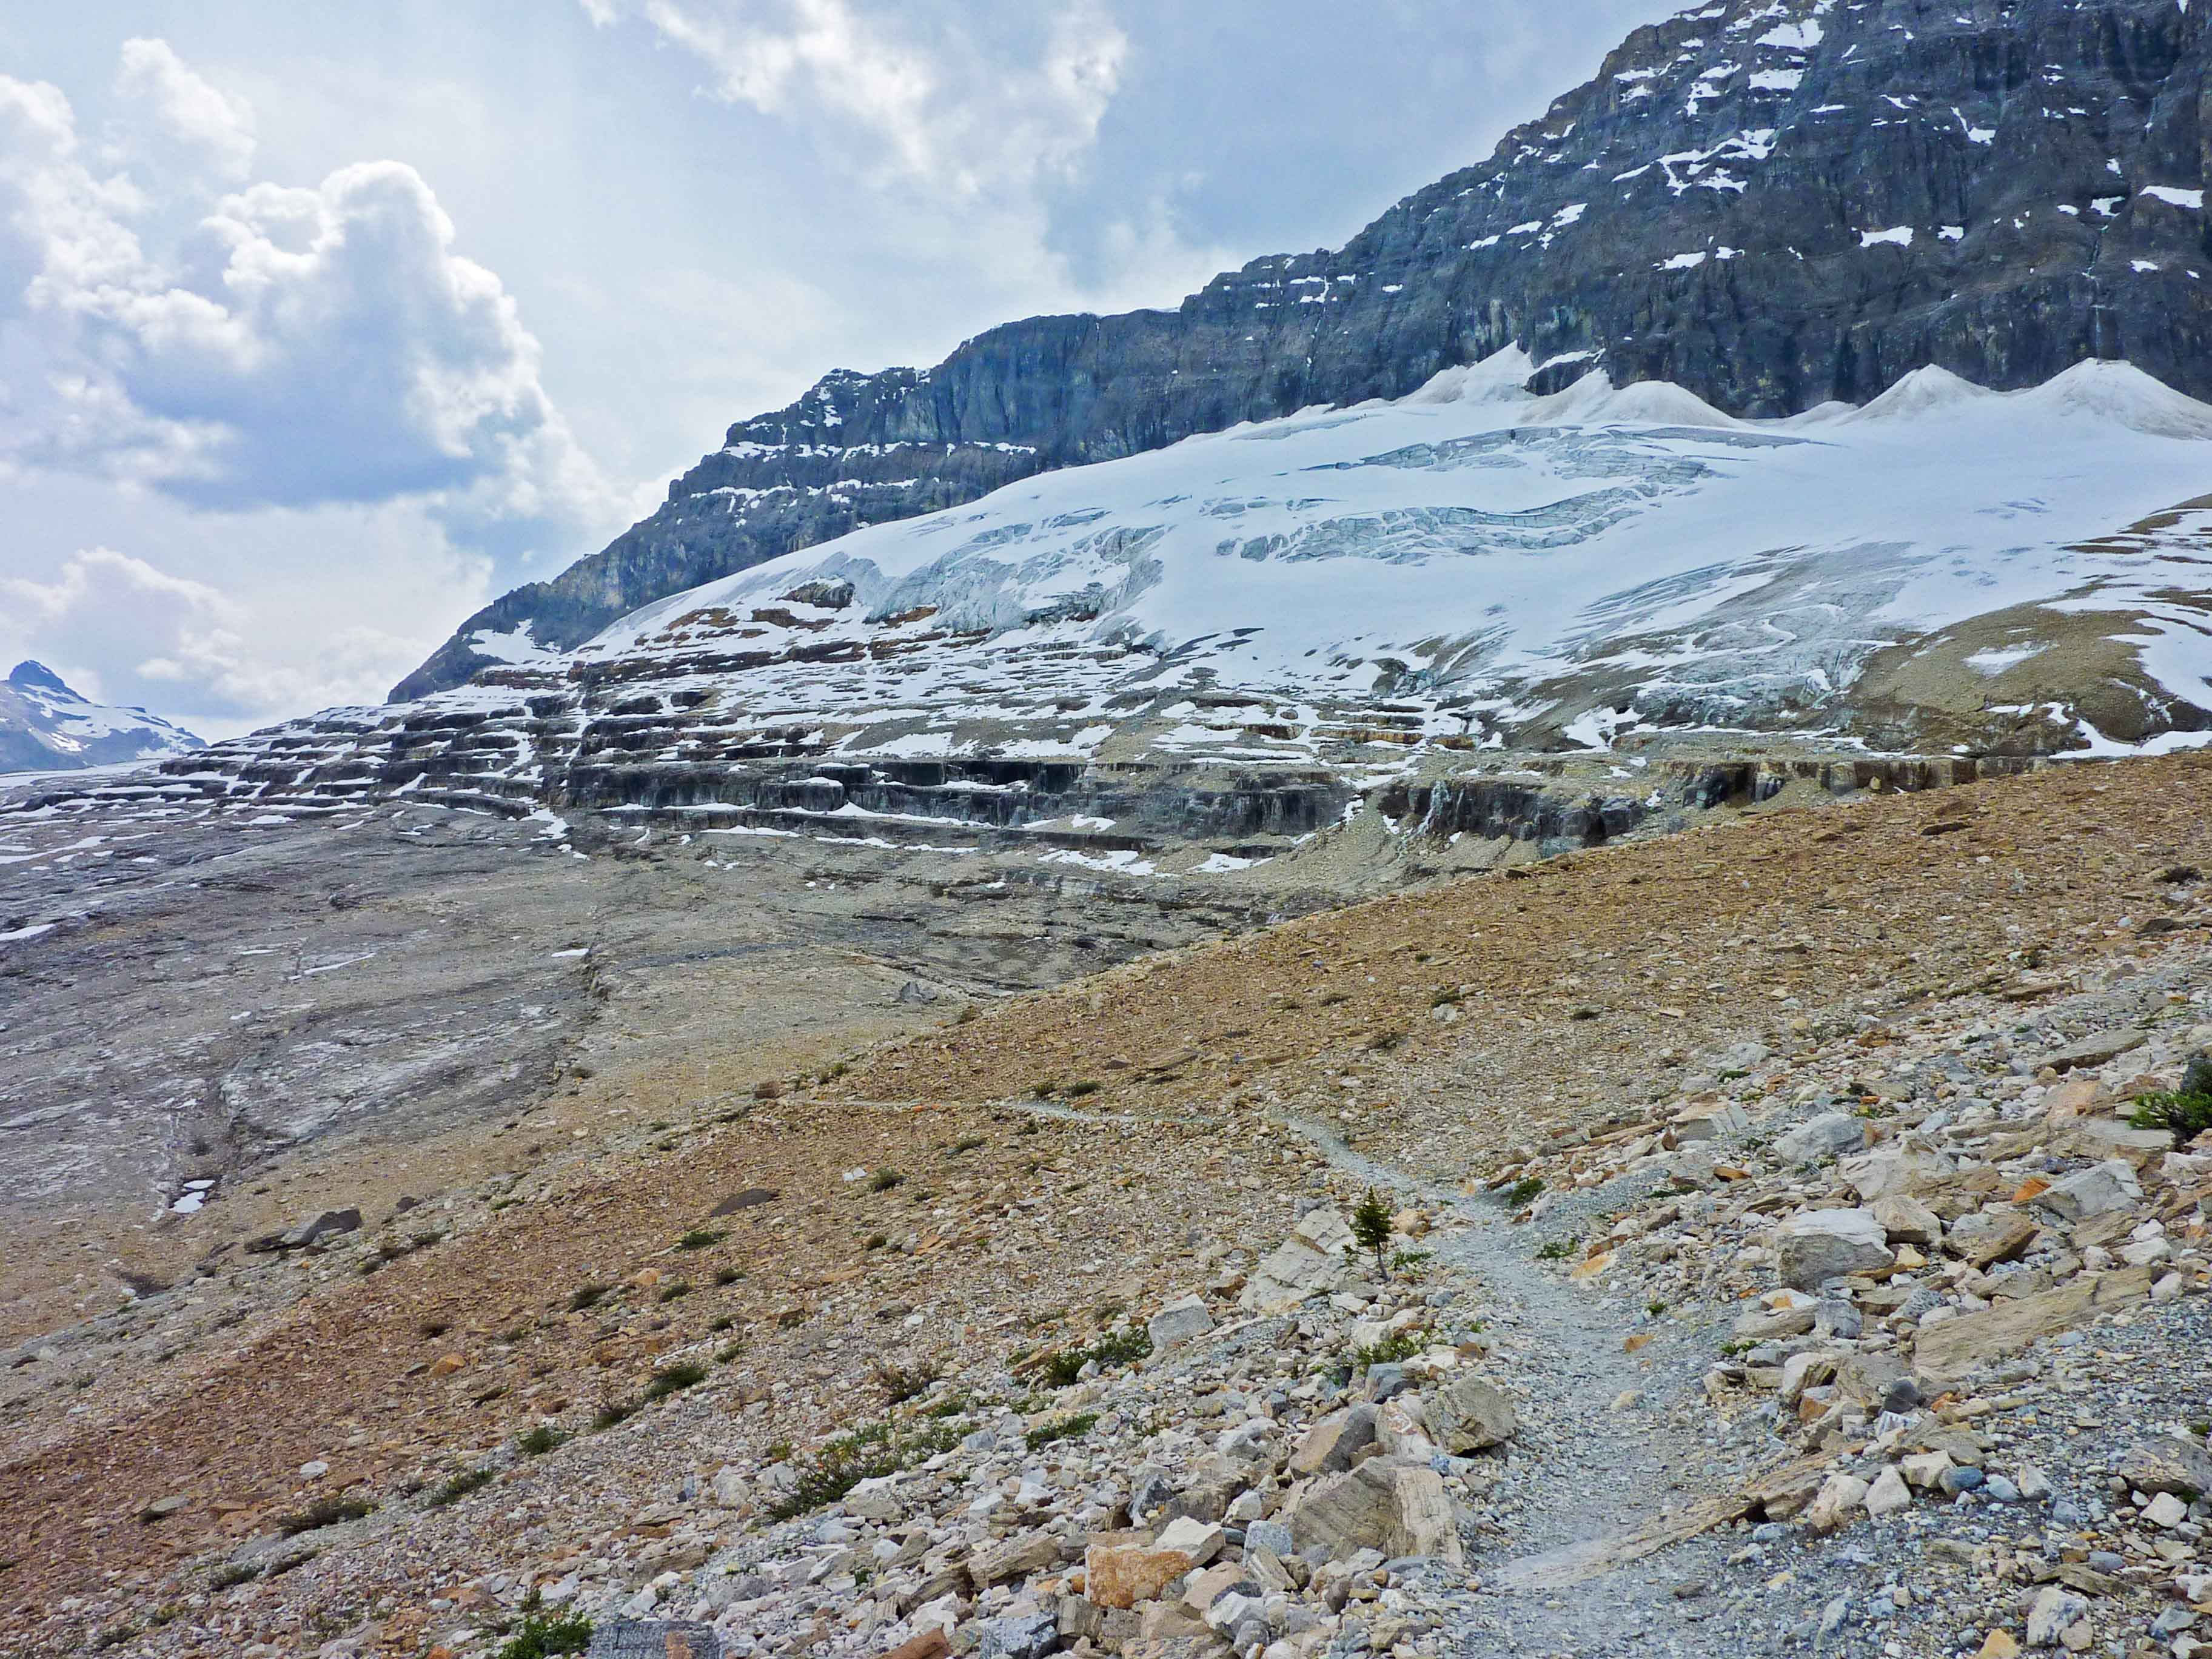 Iceline Trail - Climate Change Hike